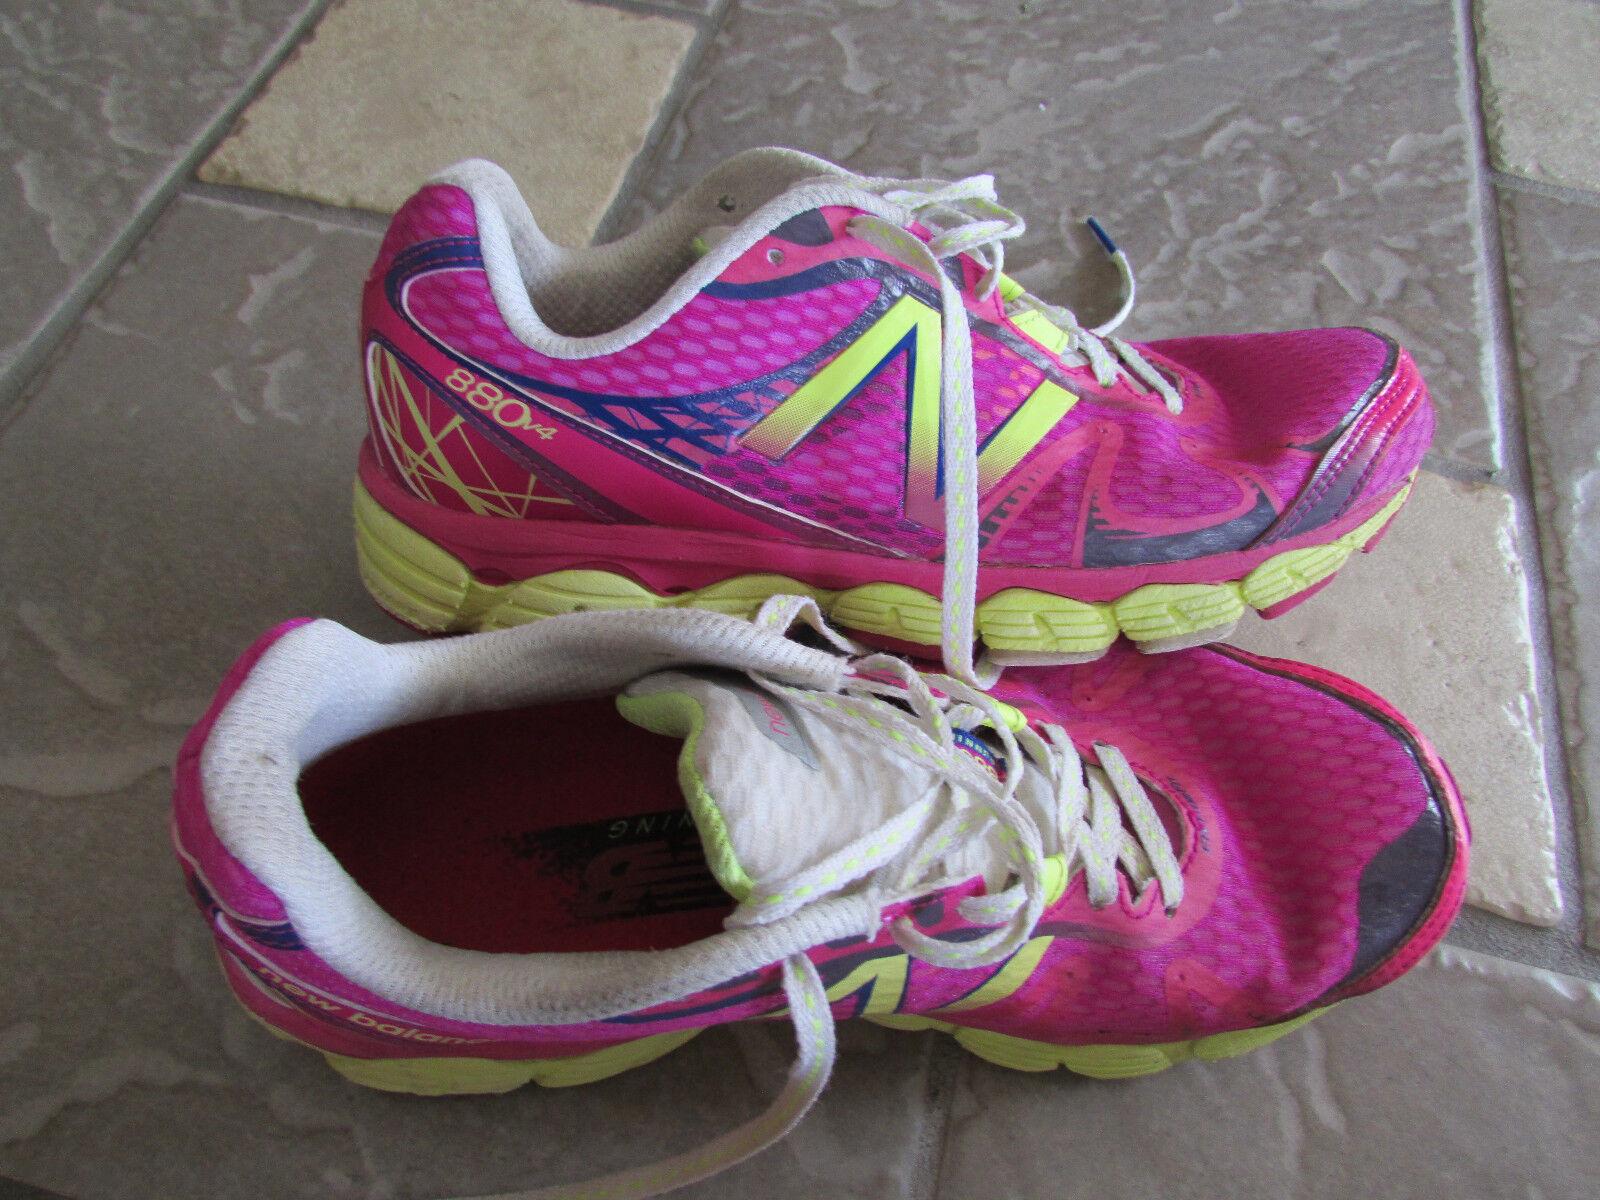 Running 5 Run Free 7 2 Womens Style Shoes 2011 443816 Nike qFnAwCRt